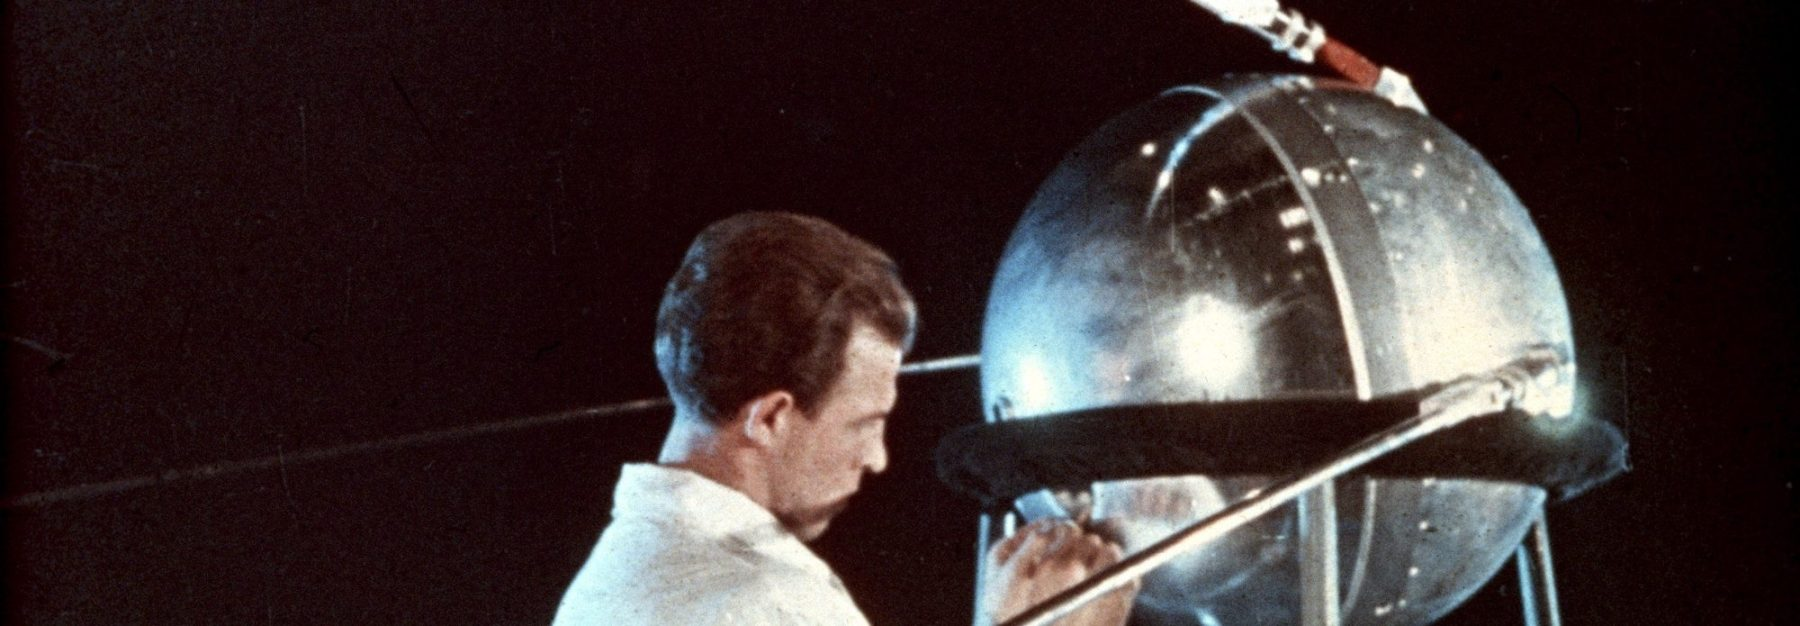 Soviet technician working on sputnik 1, 1957. (Photo by: Sovfoto/UIG via Getty Images)